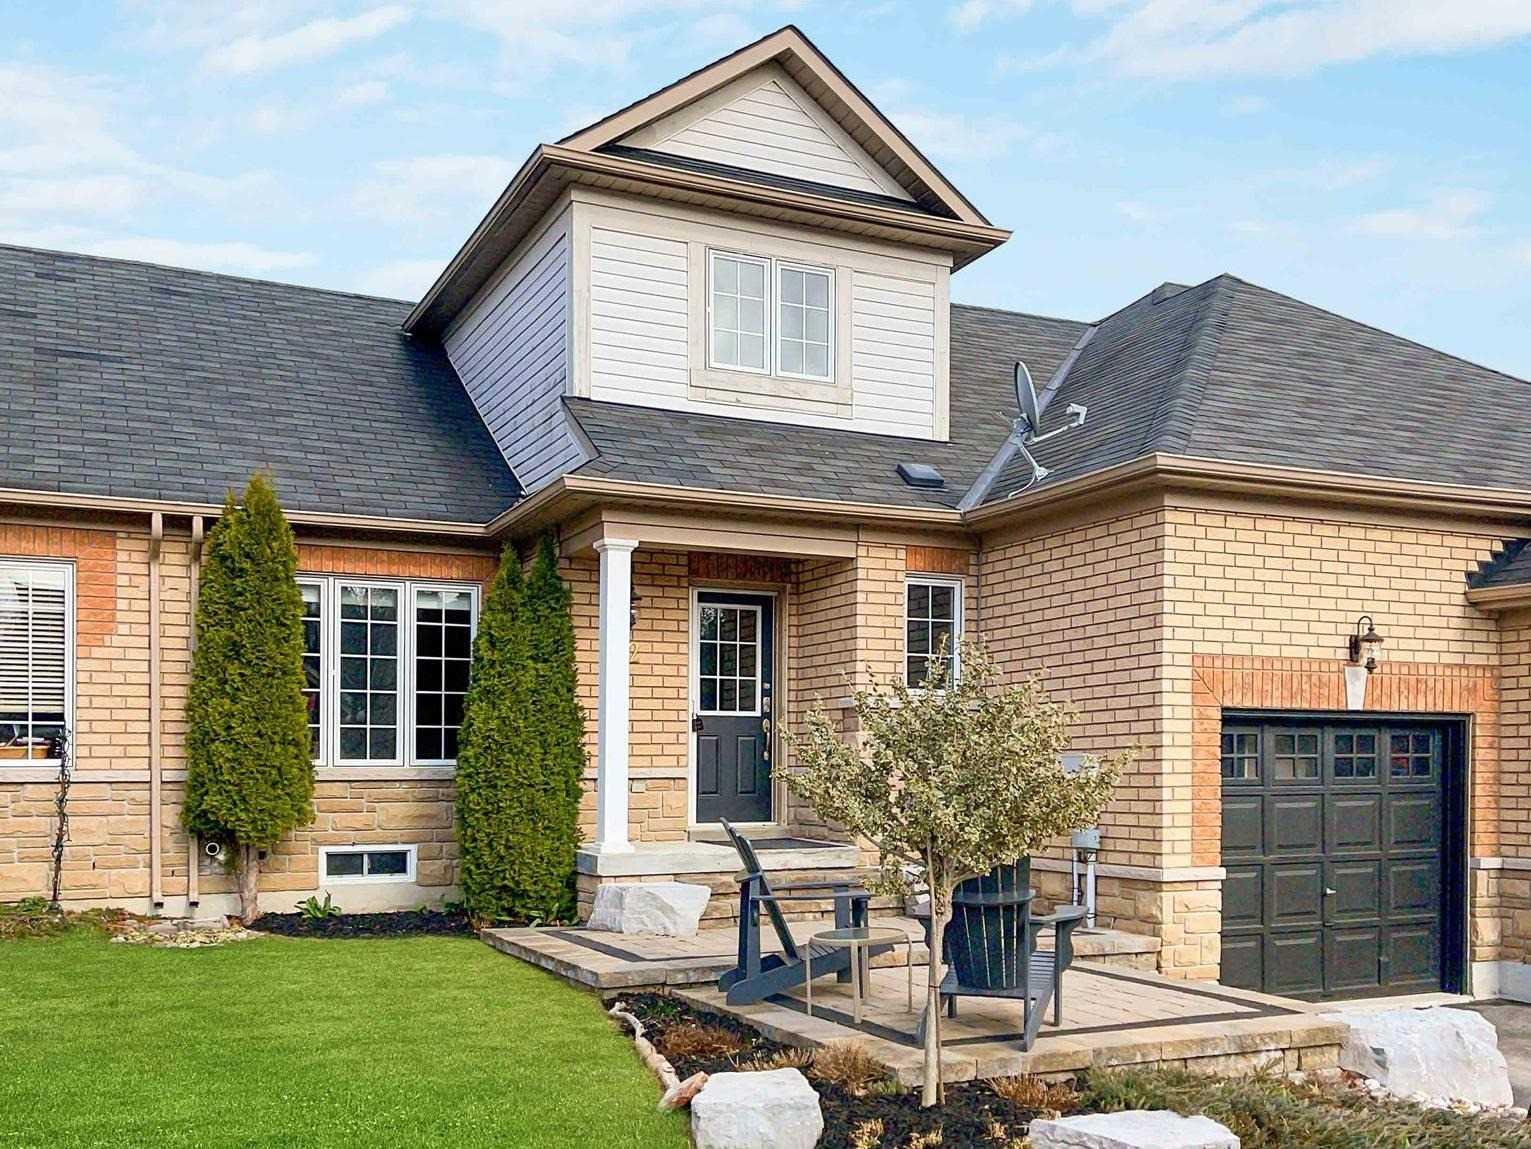 22 Meadow's End Cres, Uxbridge, Ontario L9P0A5, 2 Bedrooms Bedrooms, ,4 BathroomsBathrooms,Att/row/twnhouse,For Sale,Meadow's End,N5178102